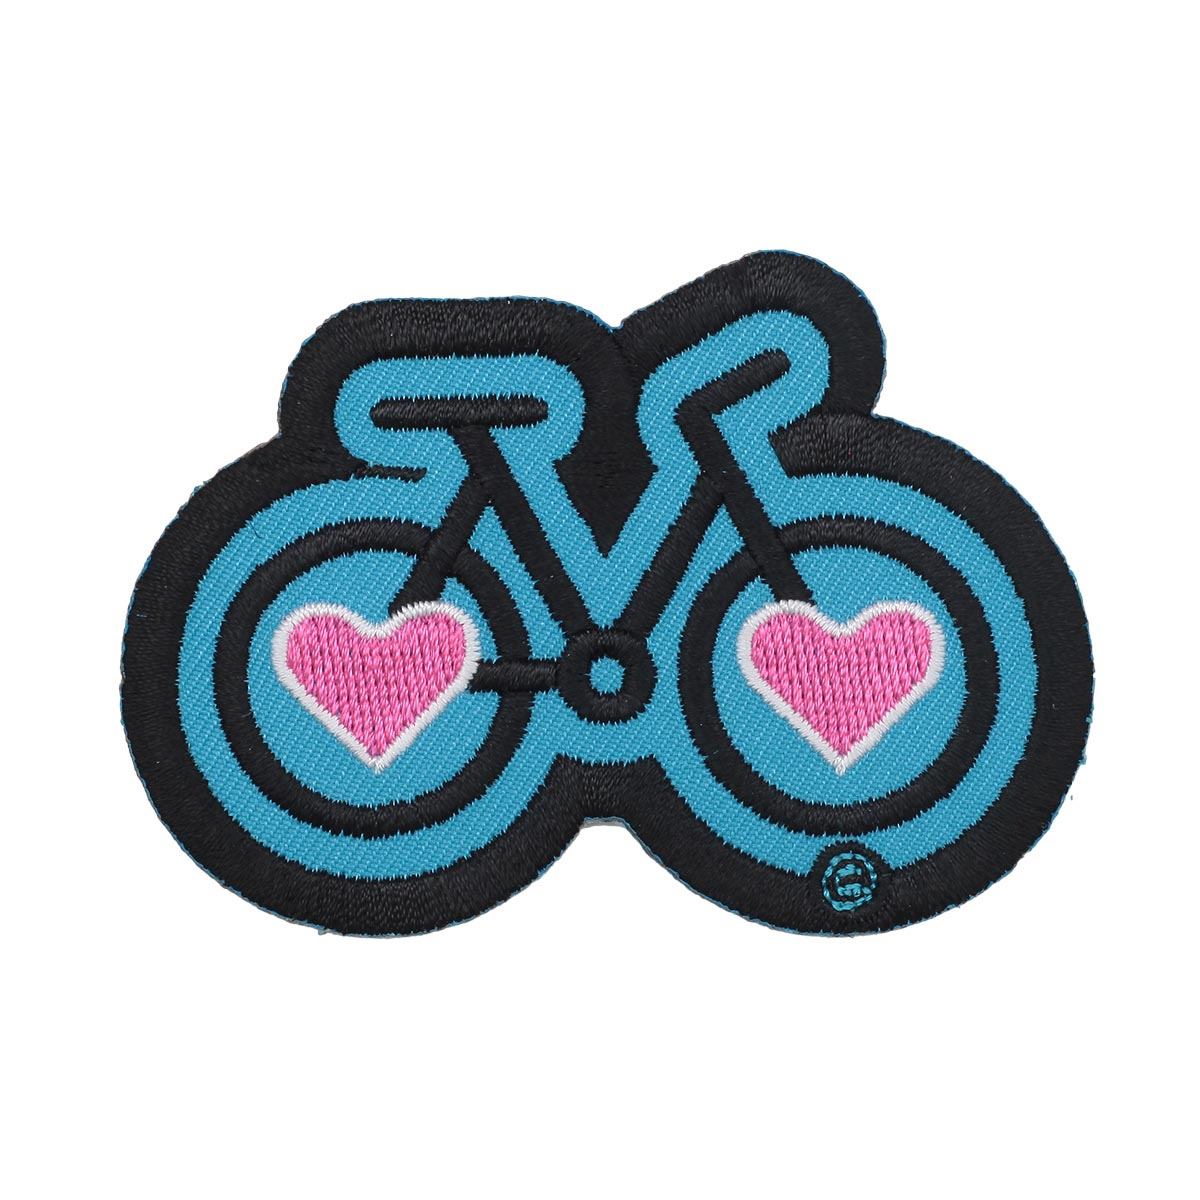 Термоаппликация 'Велосипед' 5,5*7,5см Hobby&Pro